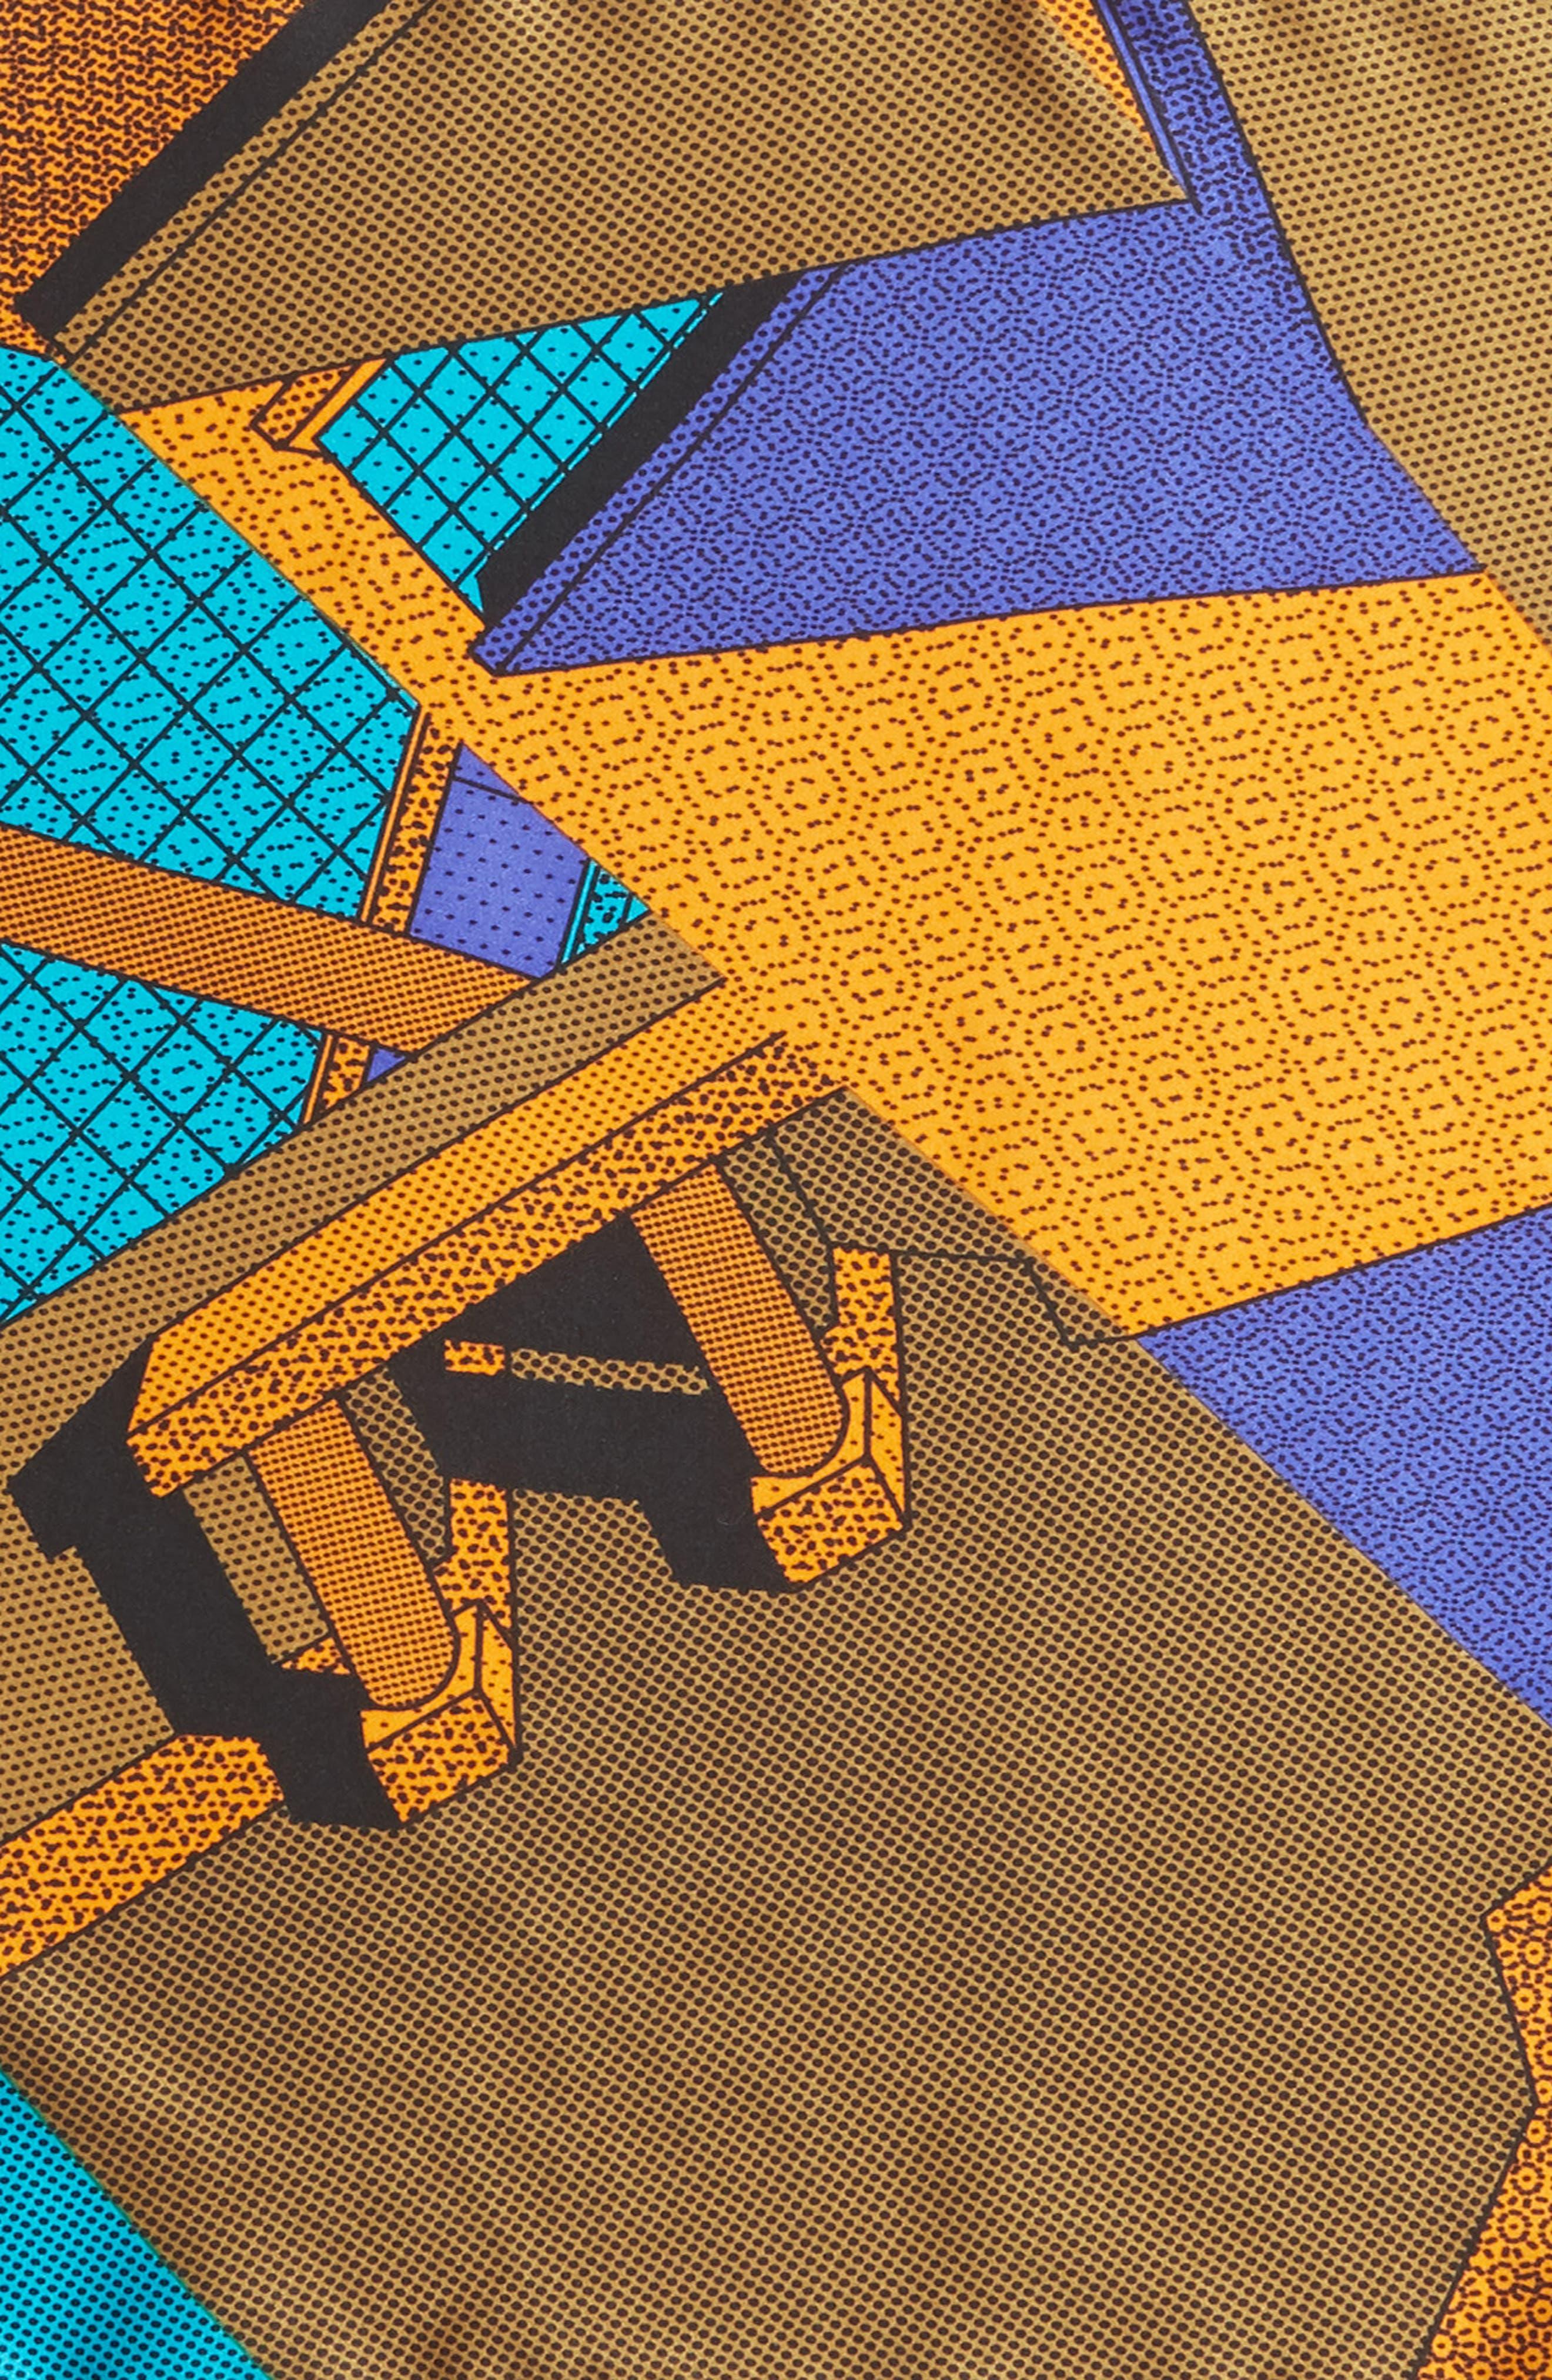 MEMPHIS Milano Pochette Silk Pocket Square,                             Alternate thumbnail 3, color,                             TEAL/ ORANGE